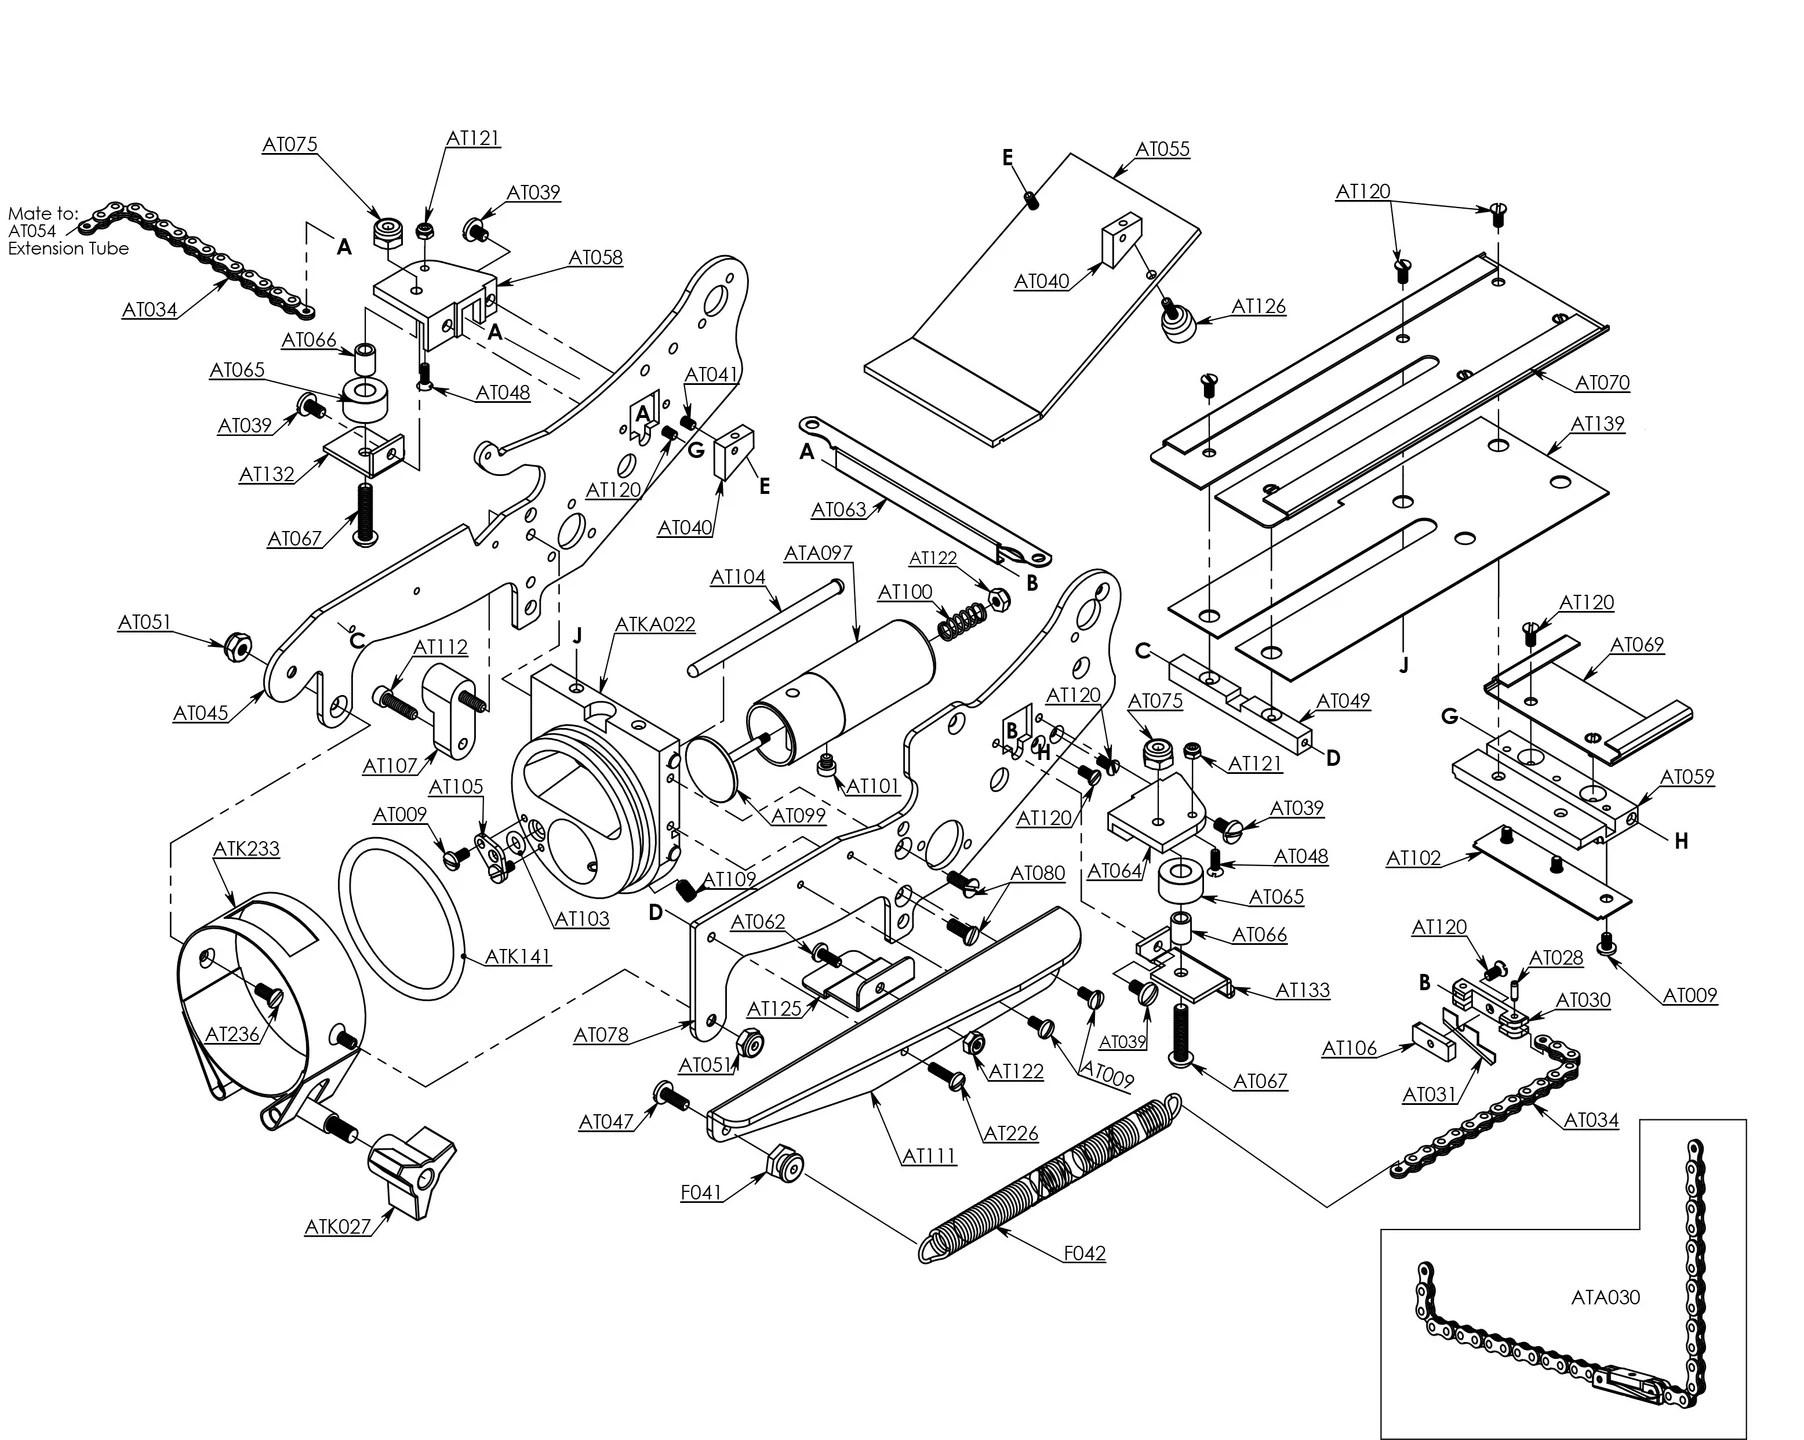 At Taper Lower Head Parts Diagram